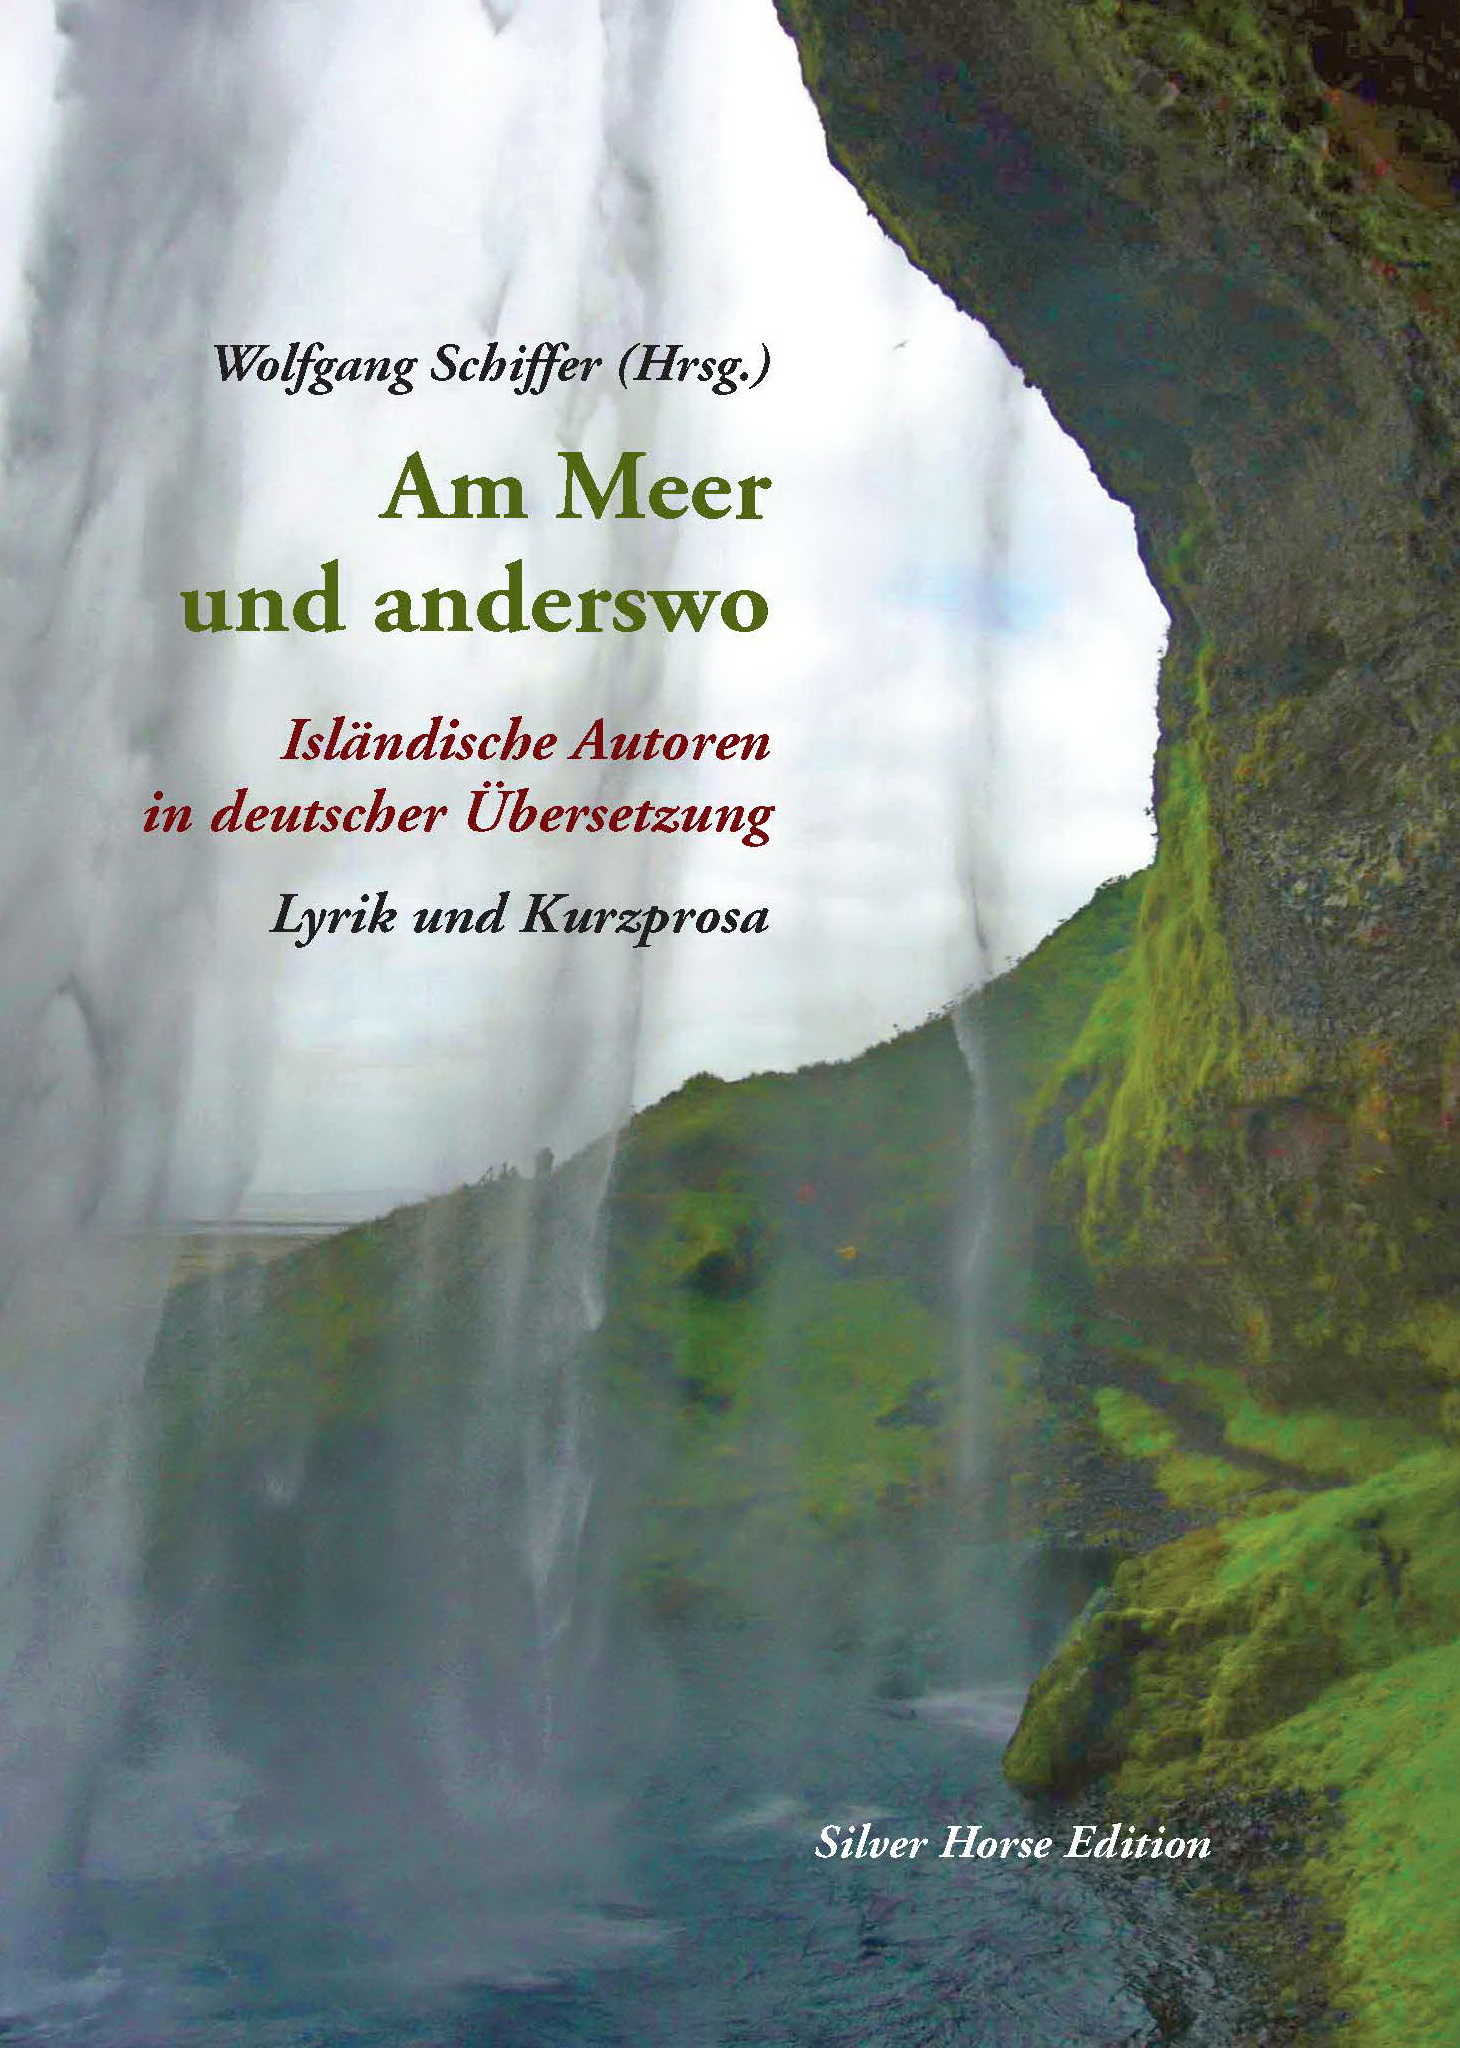 Am Meer und anderswo, Wolfgang Schiffer